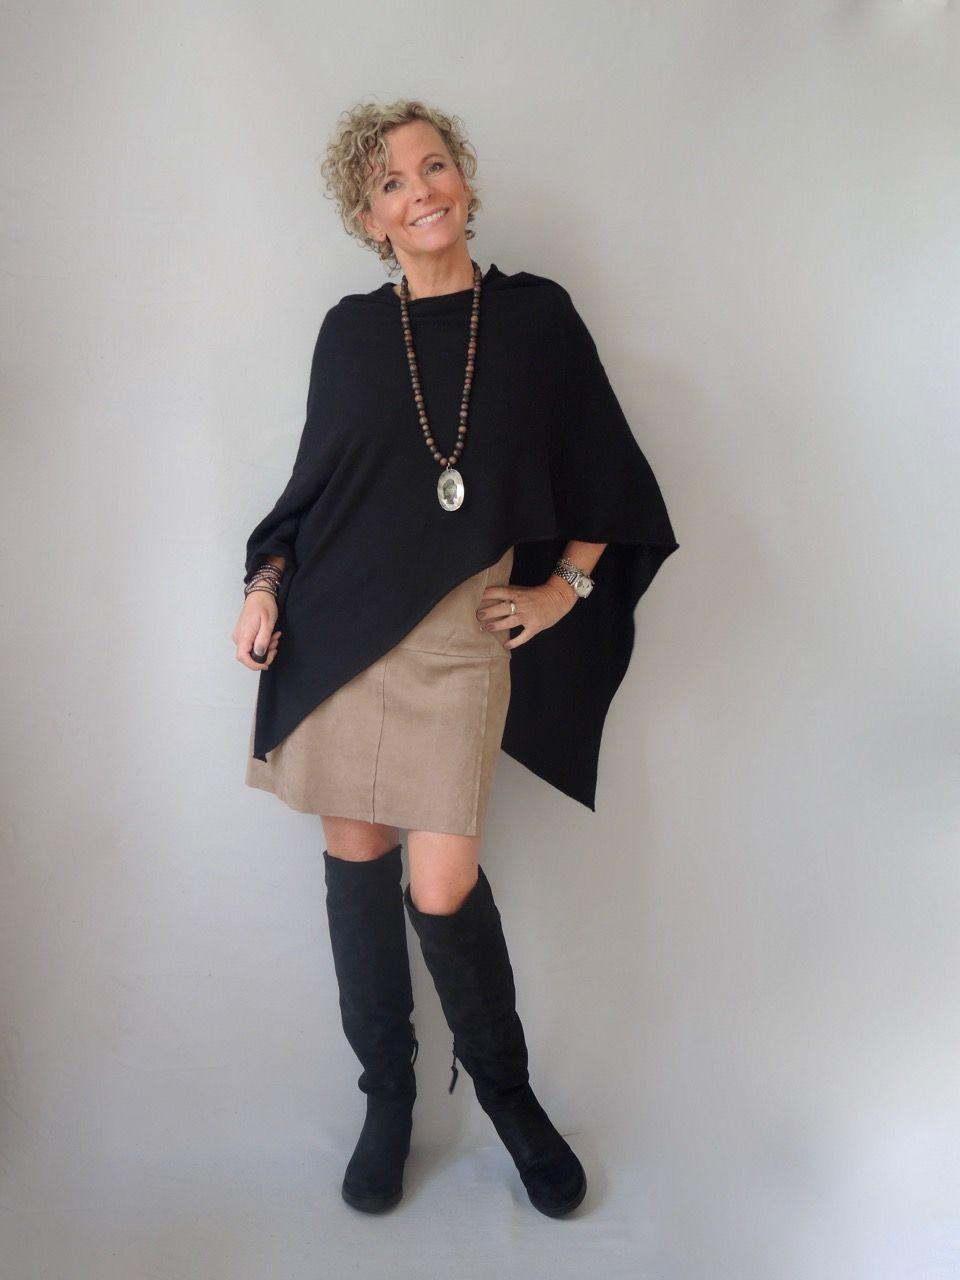 warm up f r 39 s kleidchen my style pinterest outfit kleidung und women2style. Black Bedroom Furniture Sets. Home Design Ideas